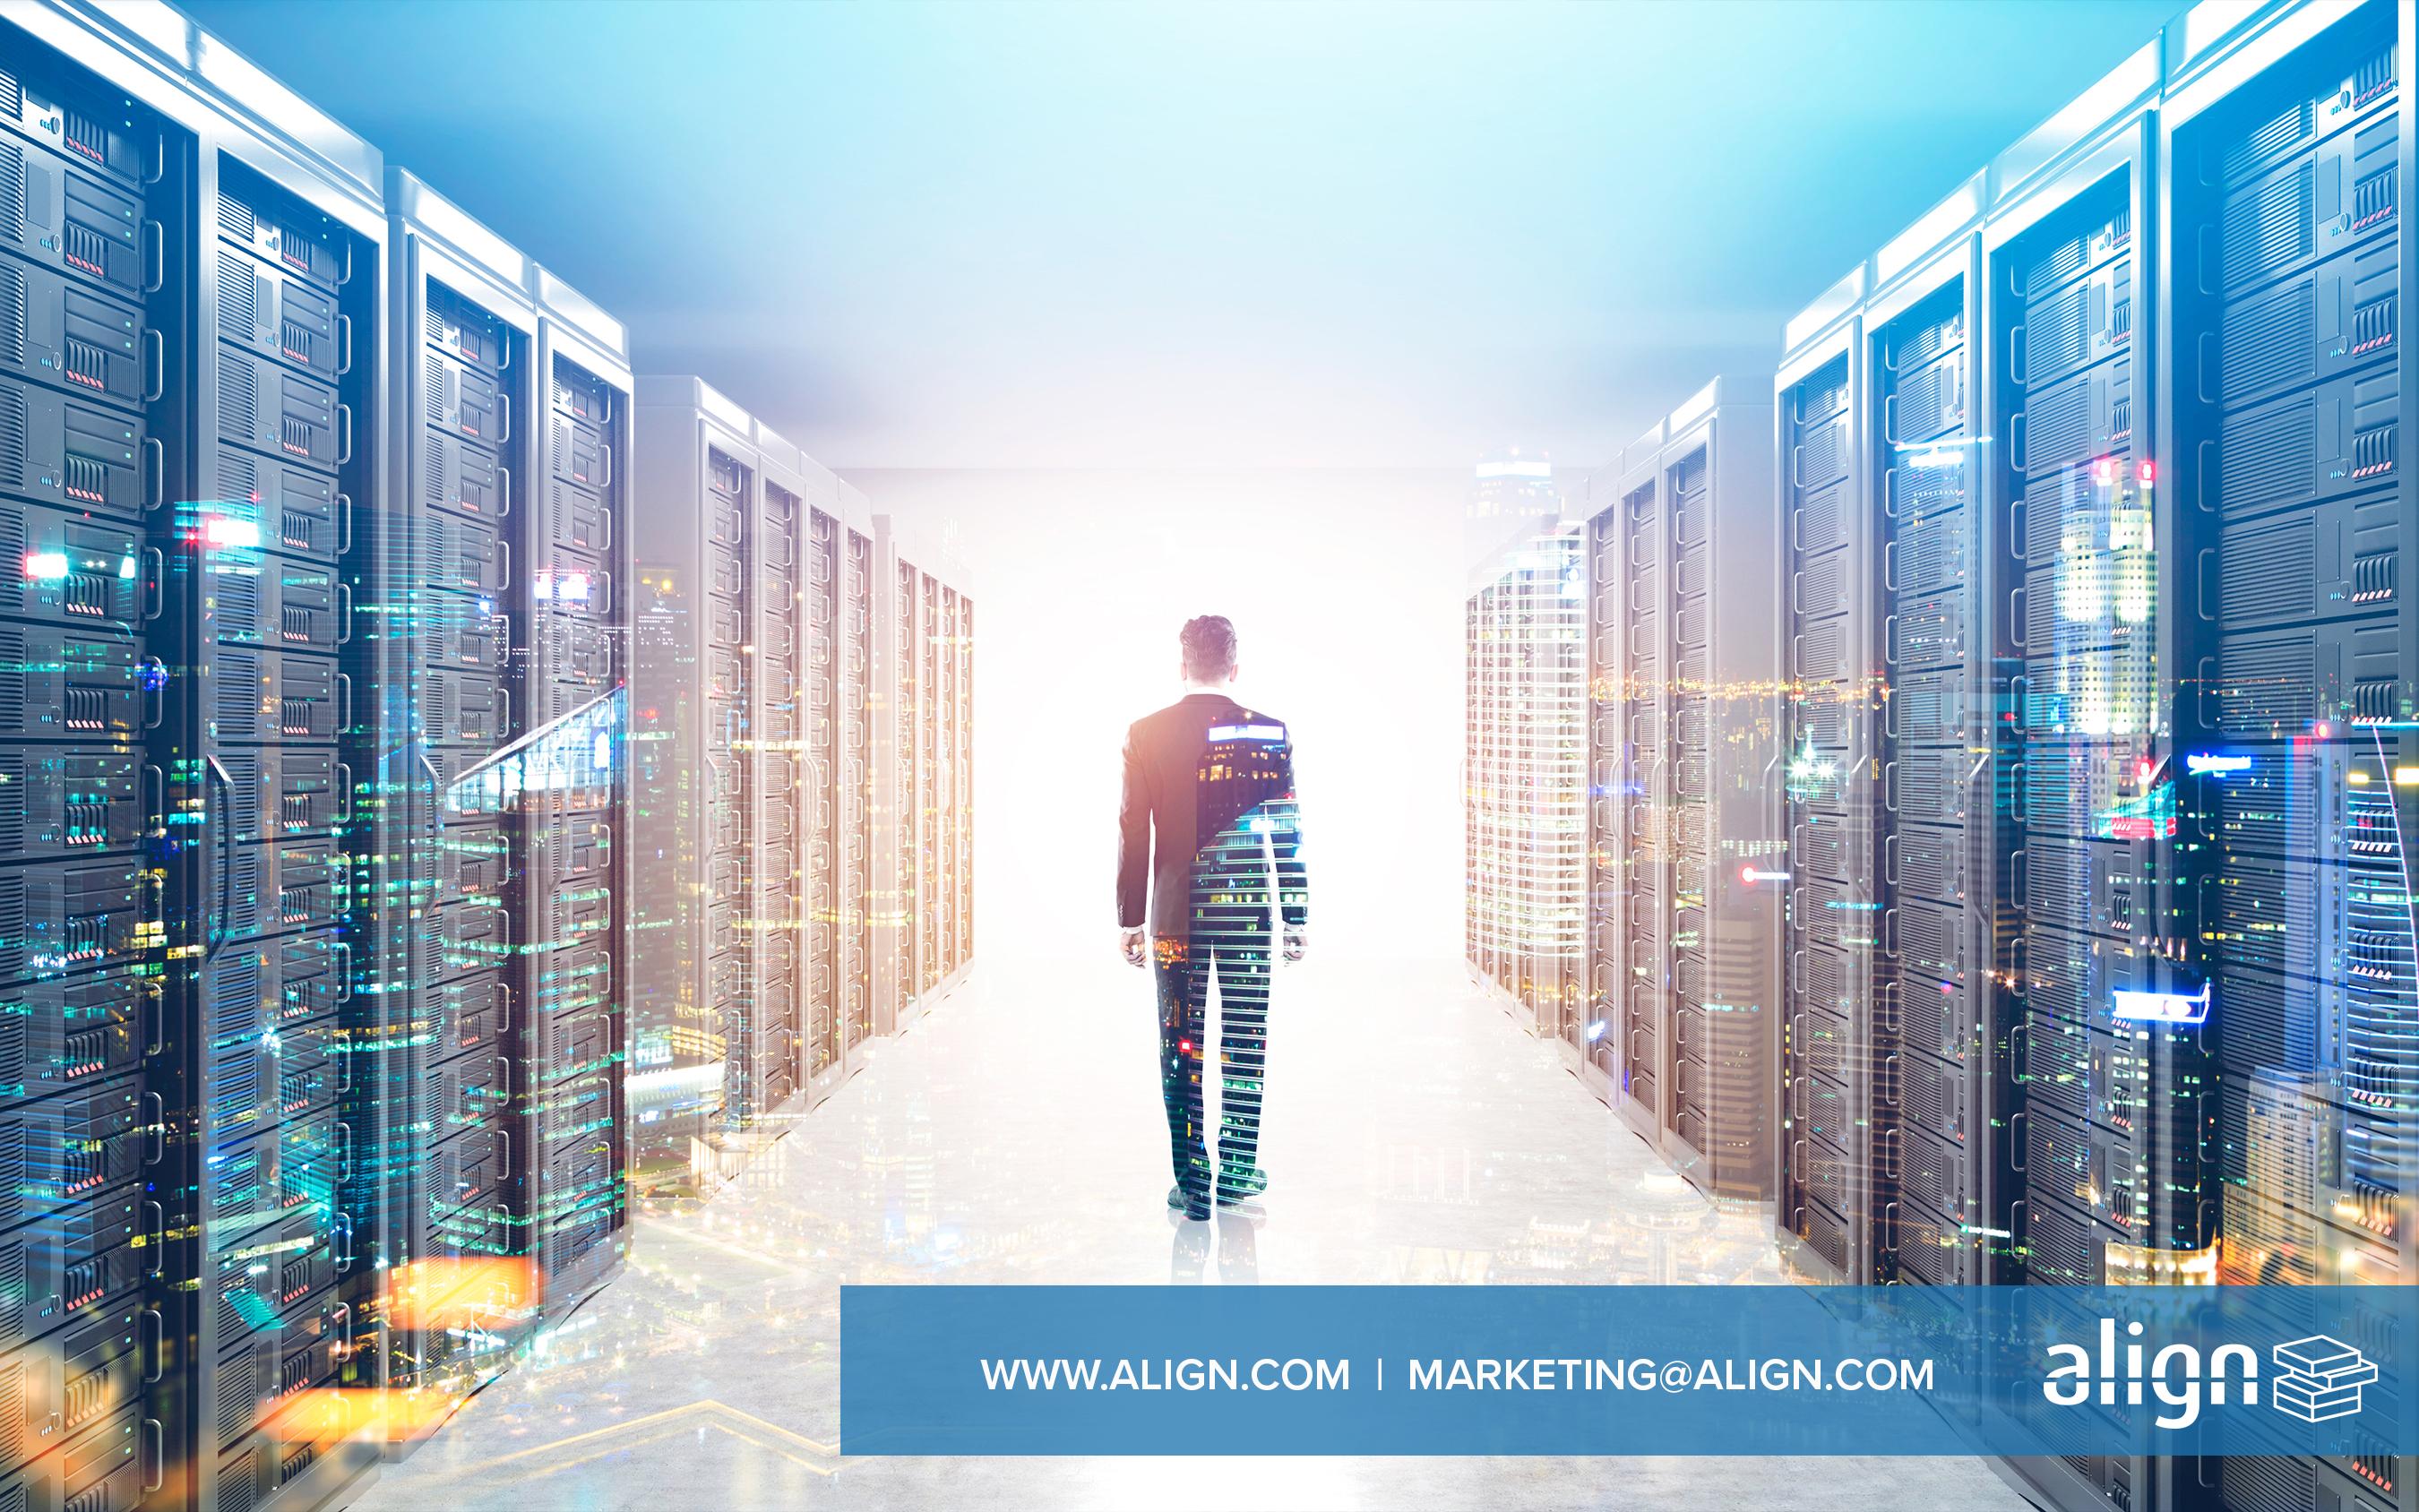 AdobeStock_164325478_Align_Data_Center_Businessman